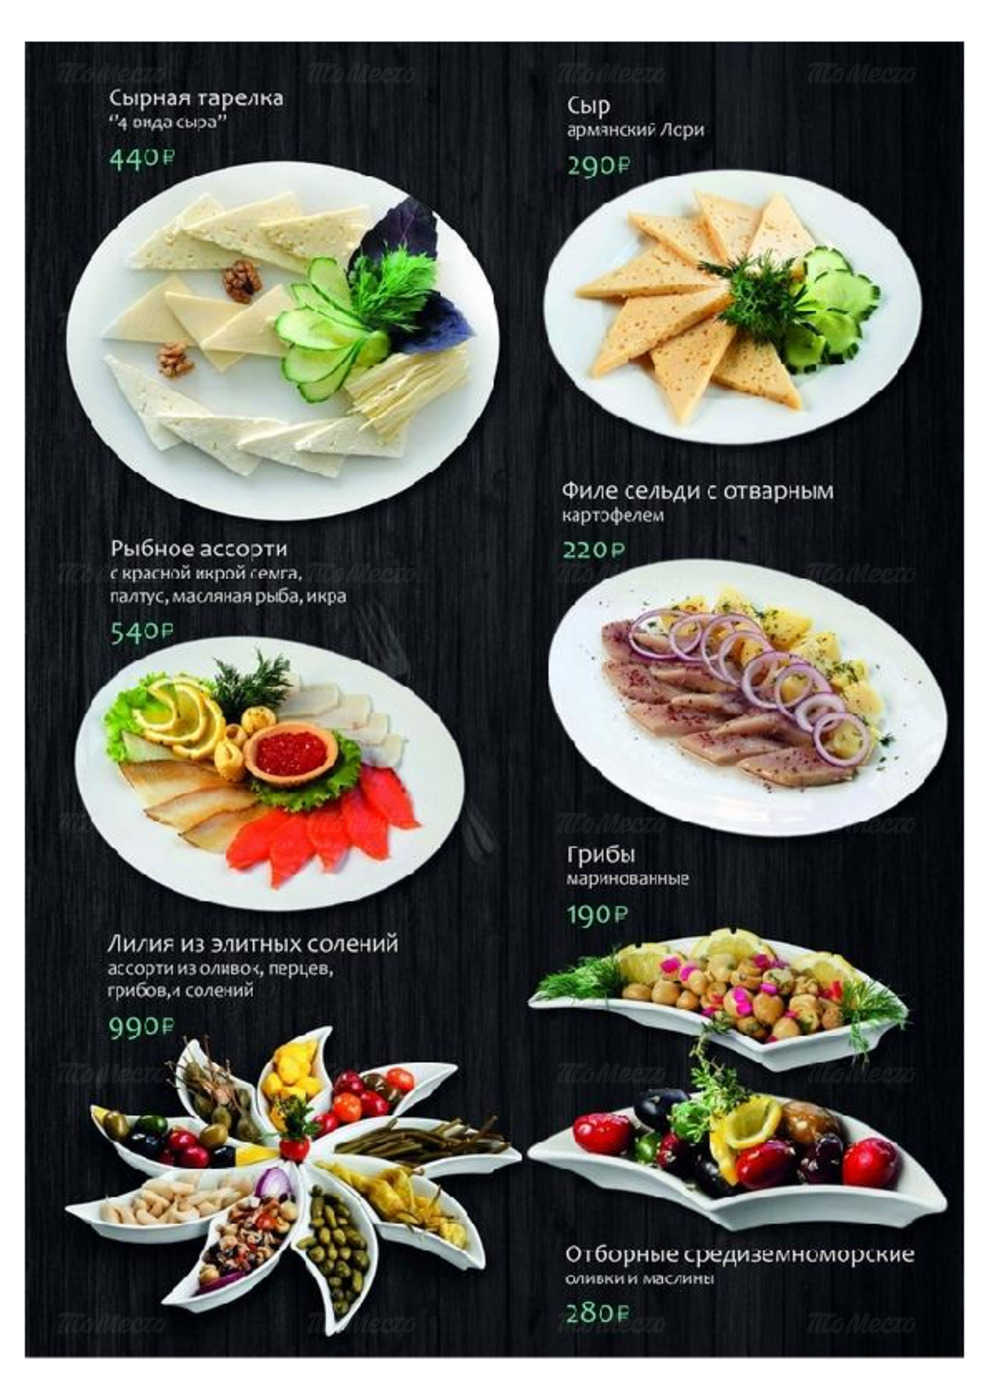 Меню ресторана Любимый Хабиб на проспекте Стачек фото 6